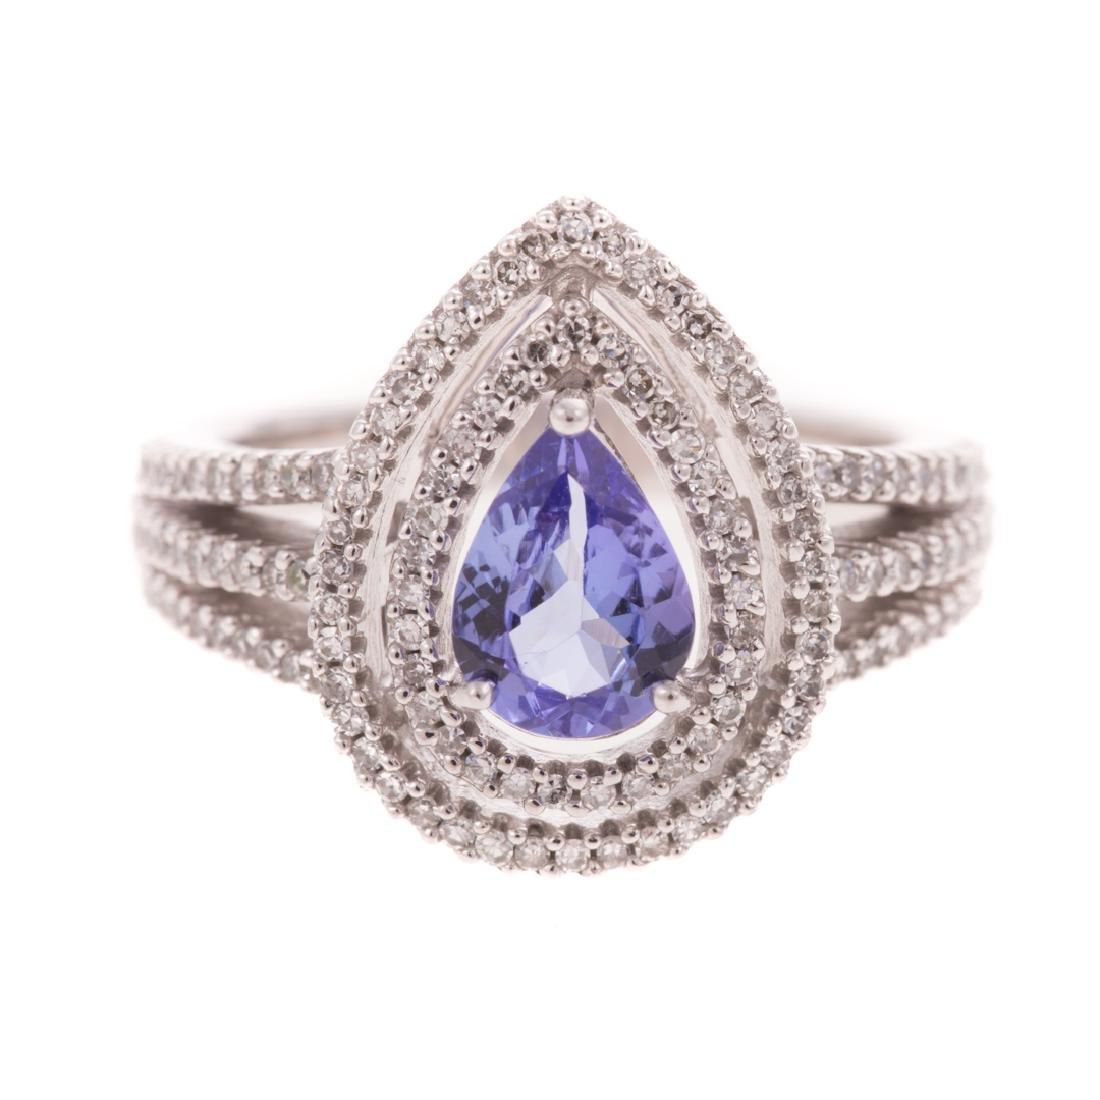 A Lady's Tanzanite and Diamond Ring 14K Gold